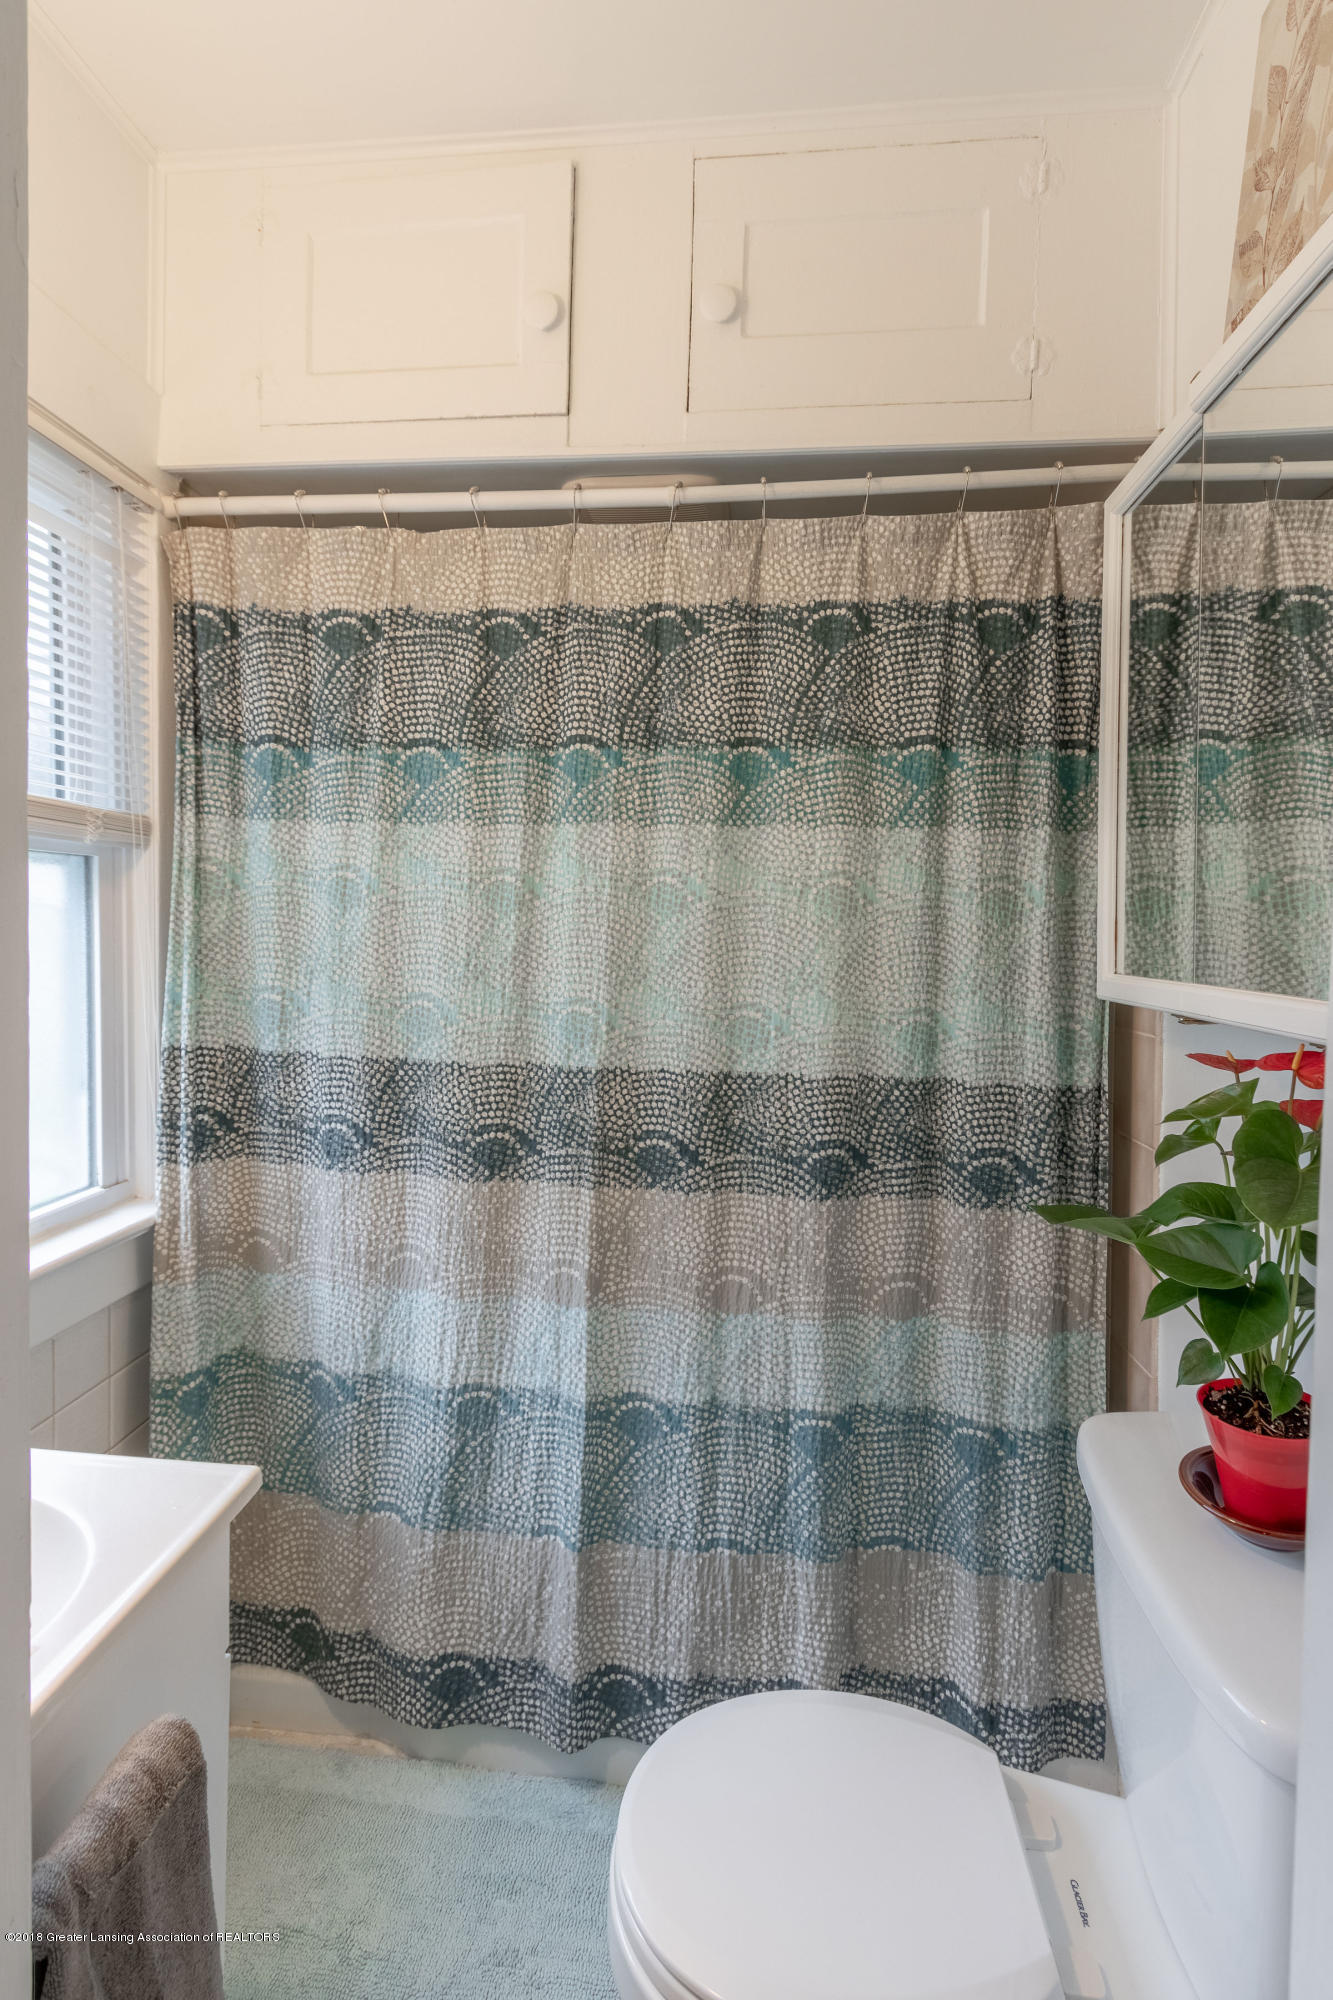 619 N Hagadorn Rd - Bathroom - 19